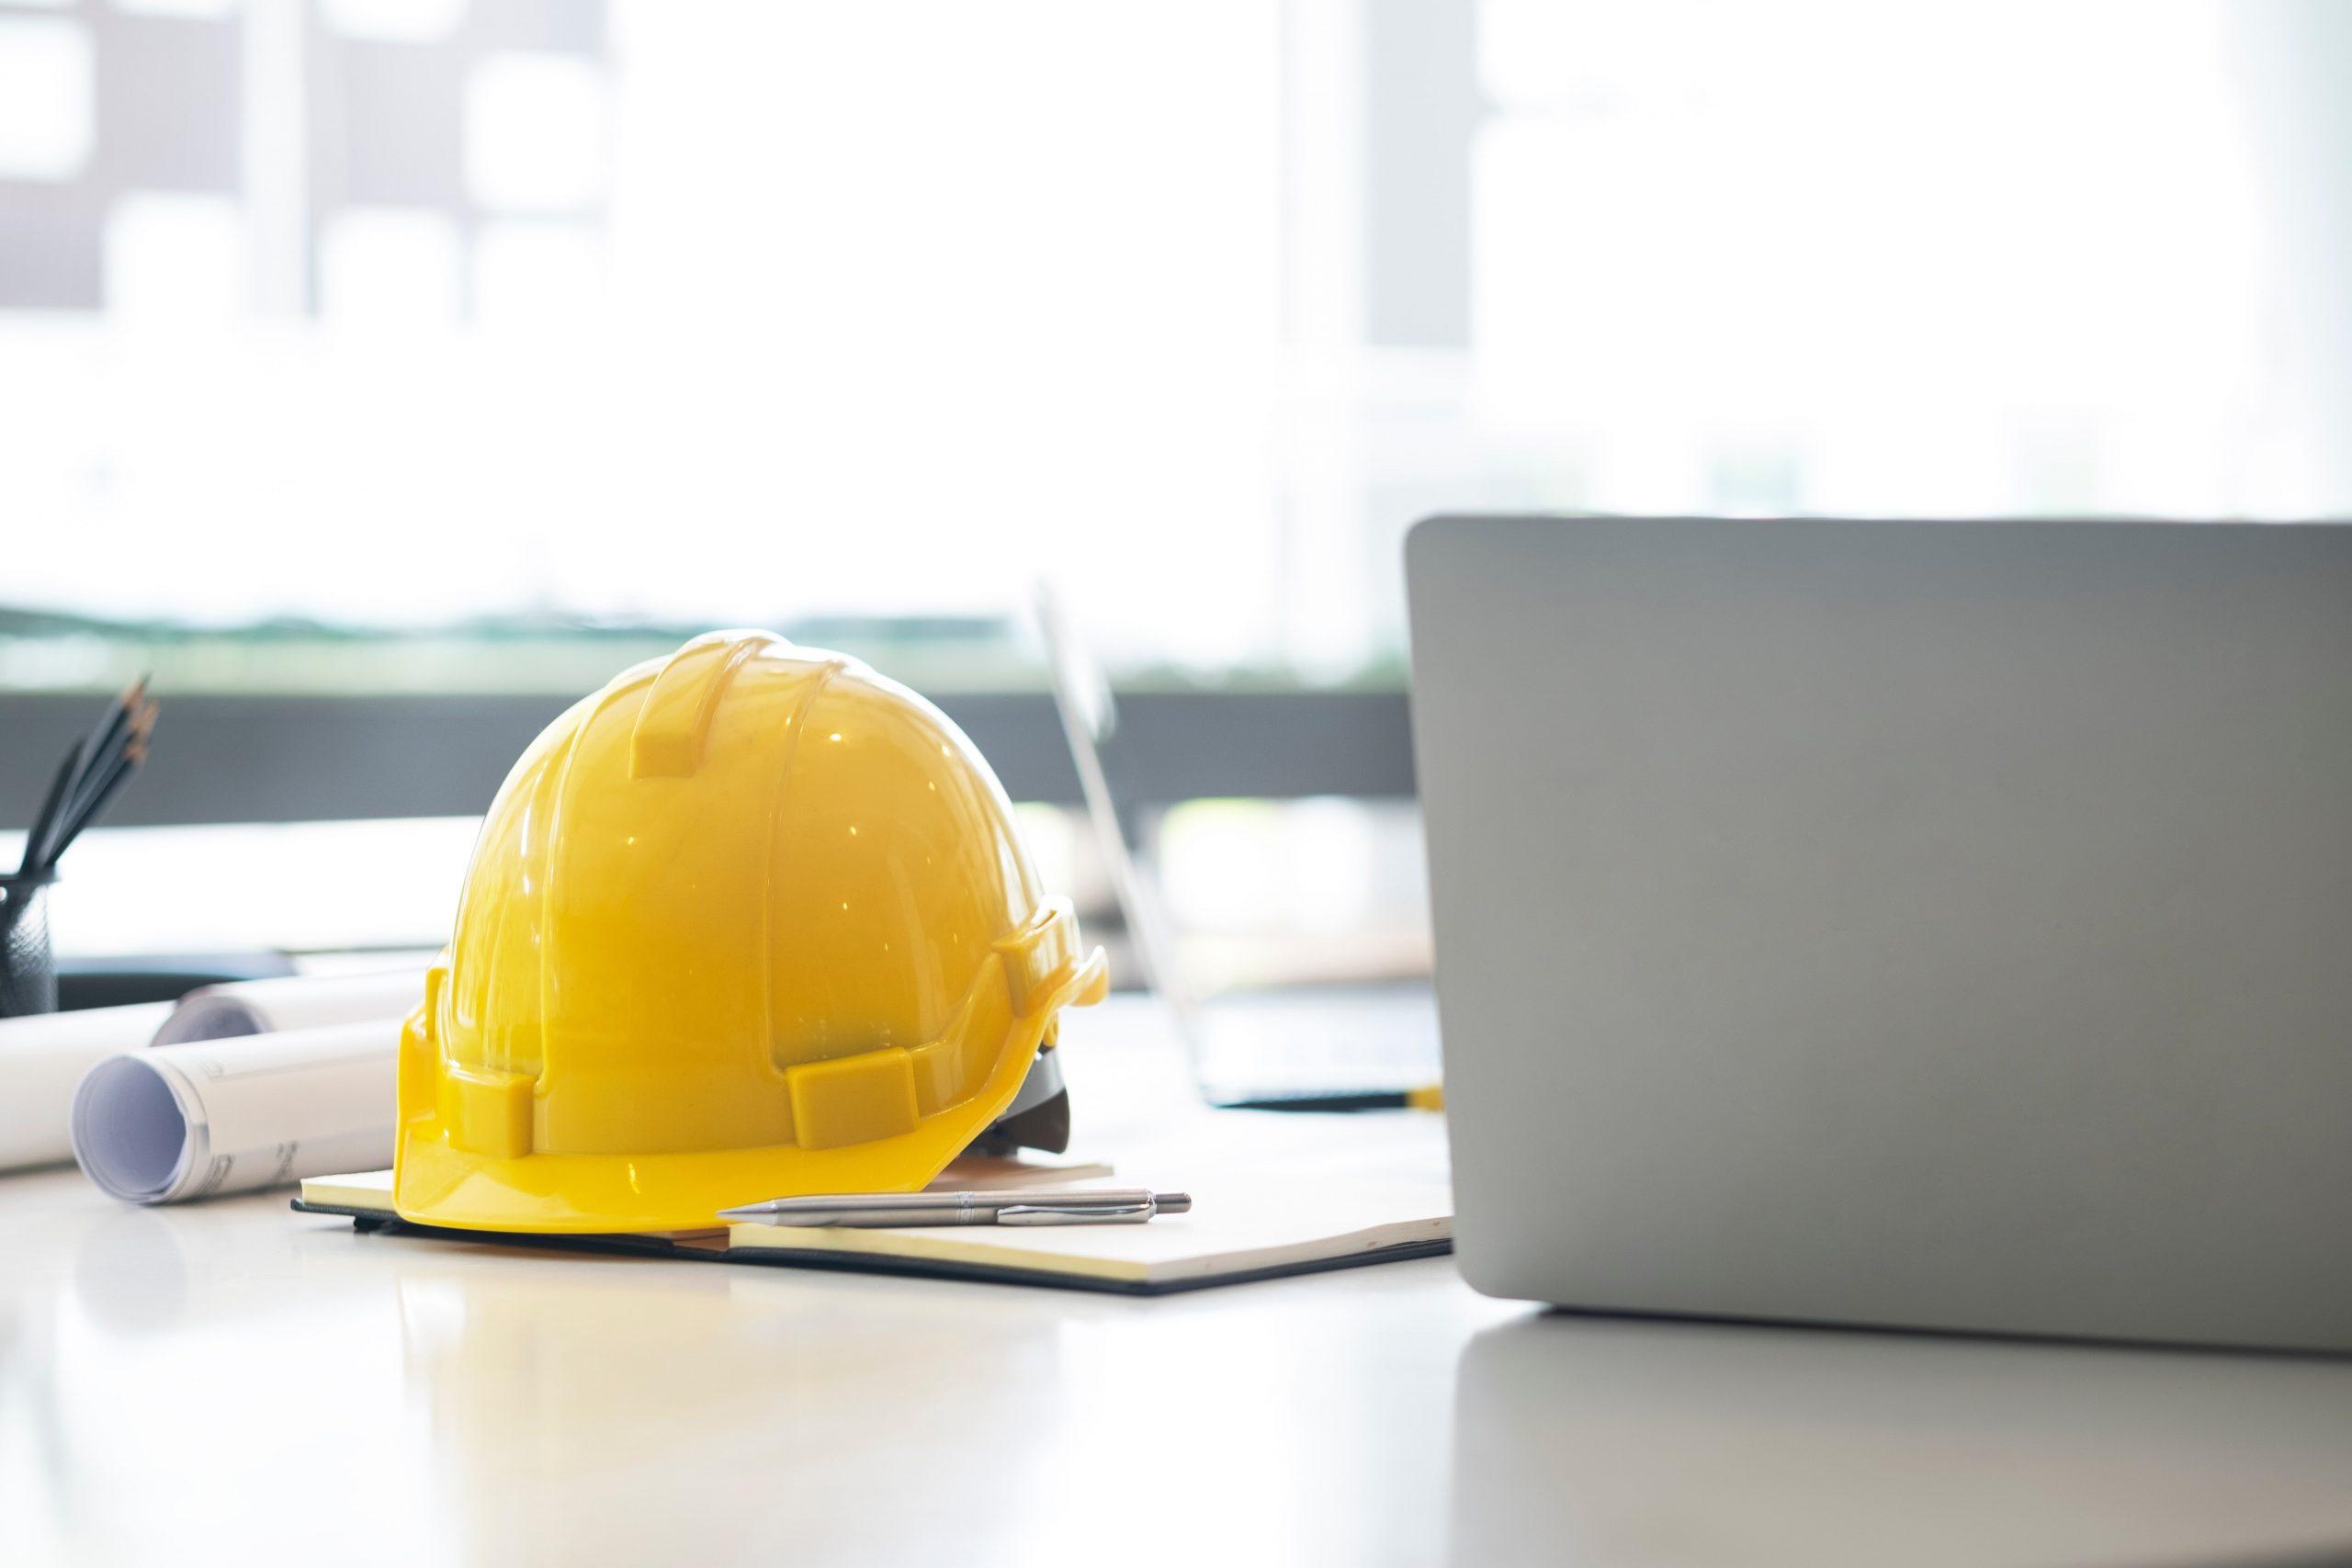 engineer-construction-office-computer-desk-UF4CVHH-min